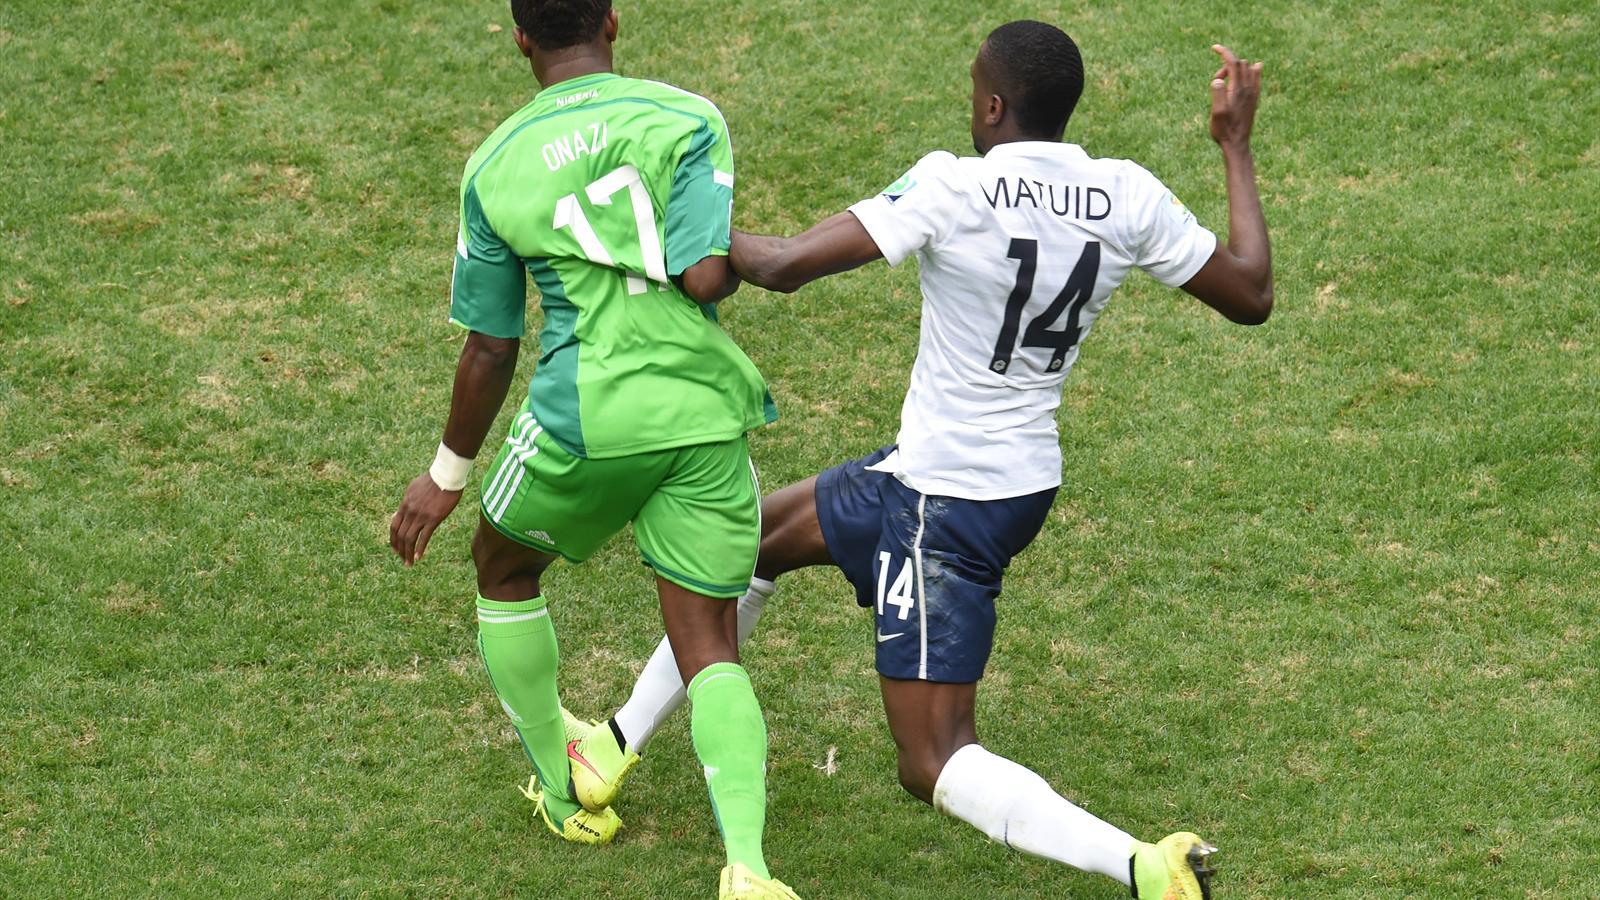 Onazi Matuidi France Nigeria 2014 AFP